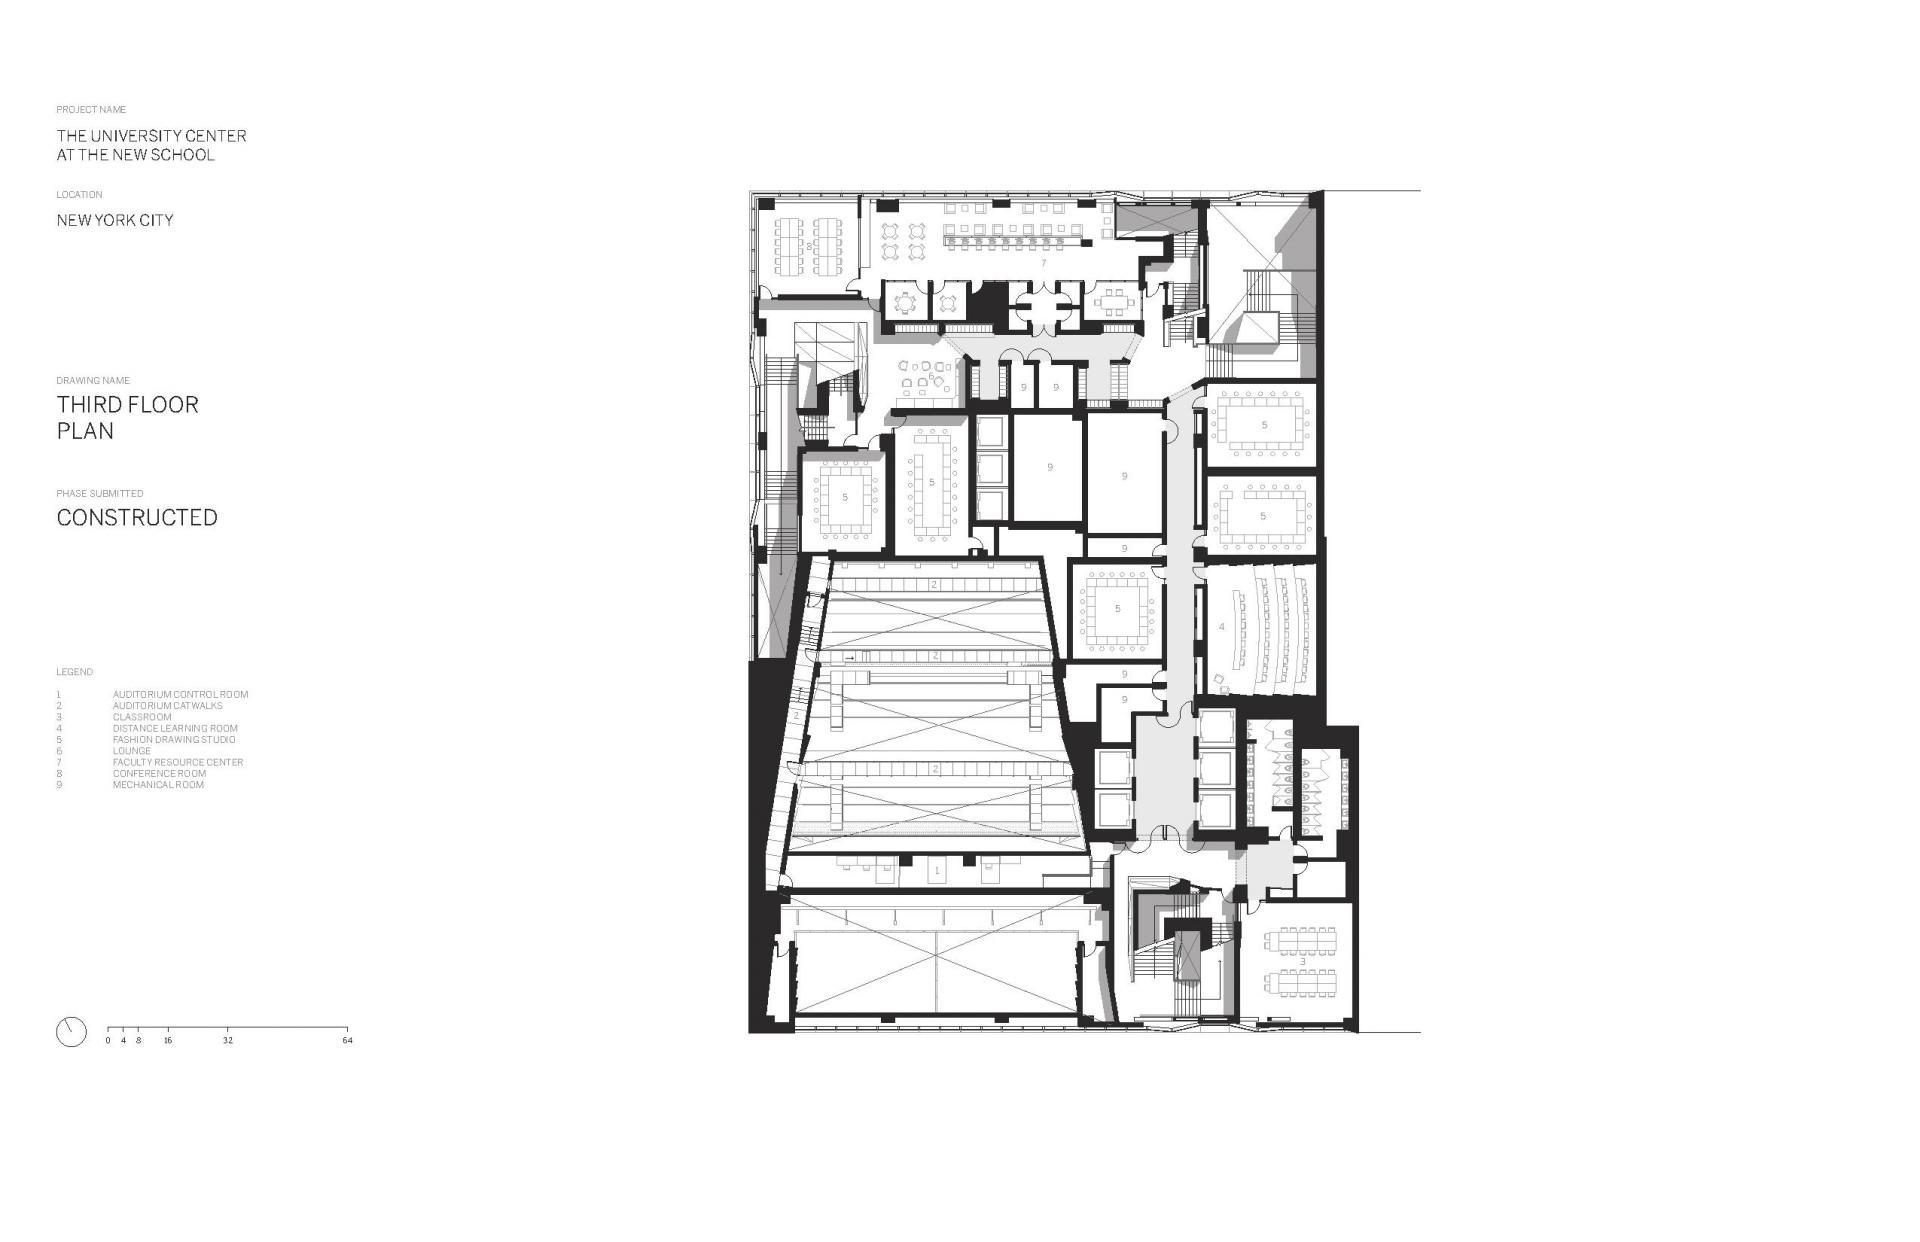 Схема учебного центра Greenwich Village в Нью Йорке - Фото 4